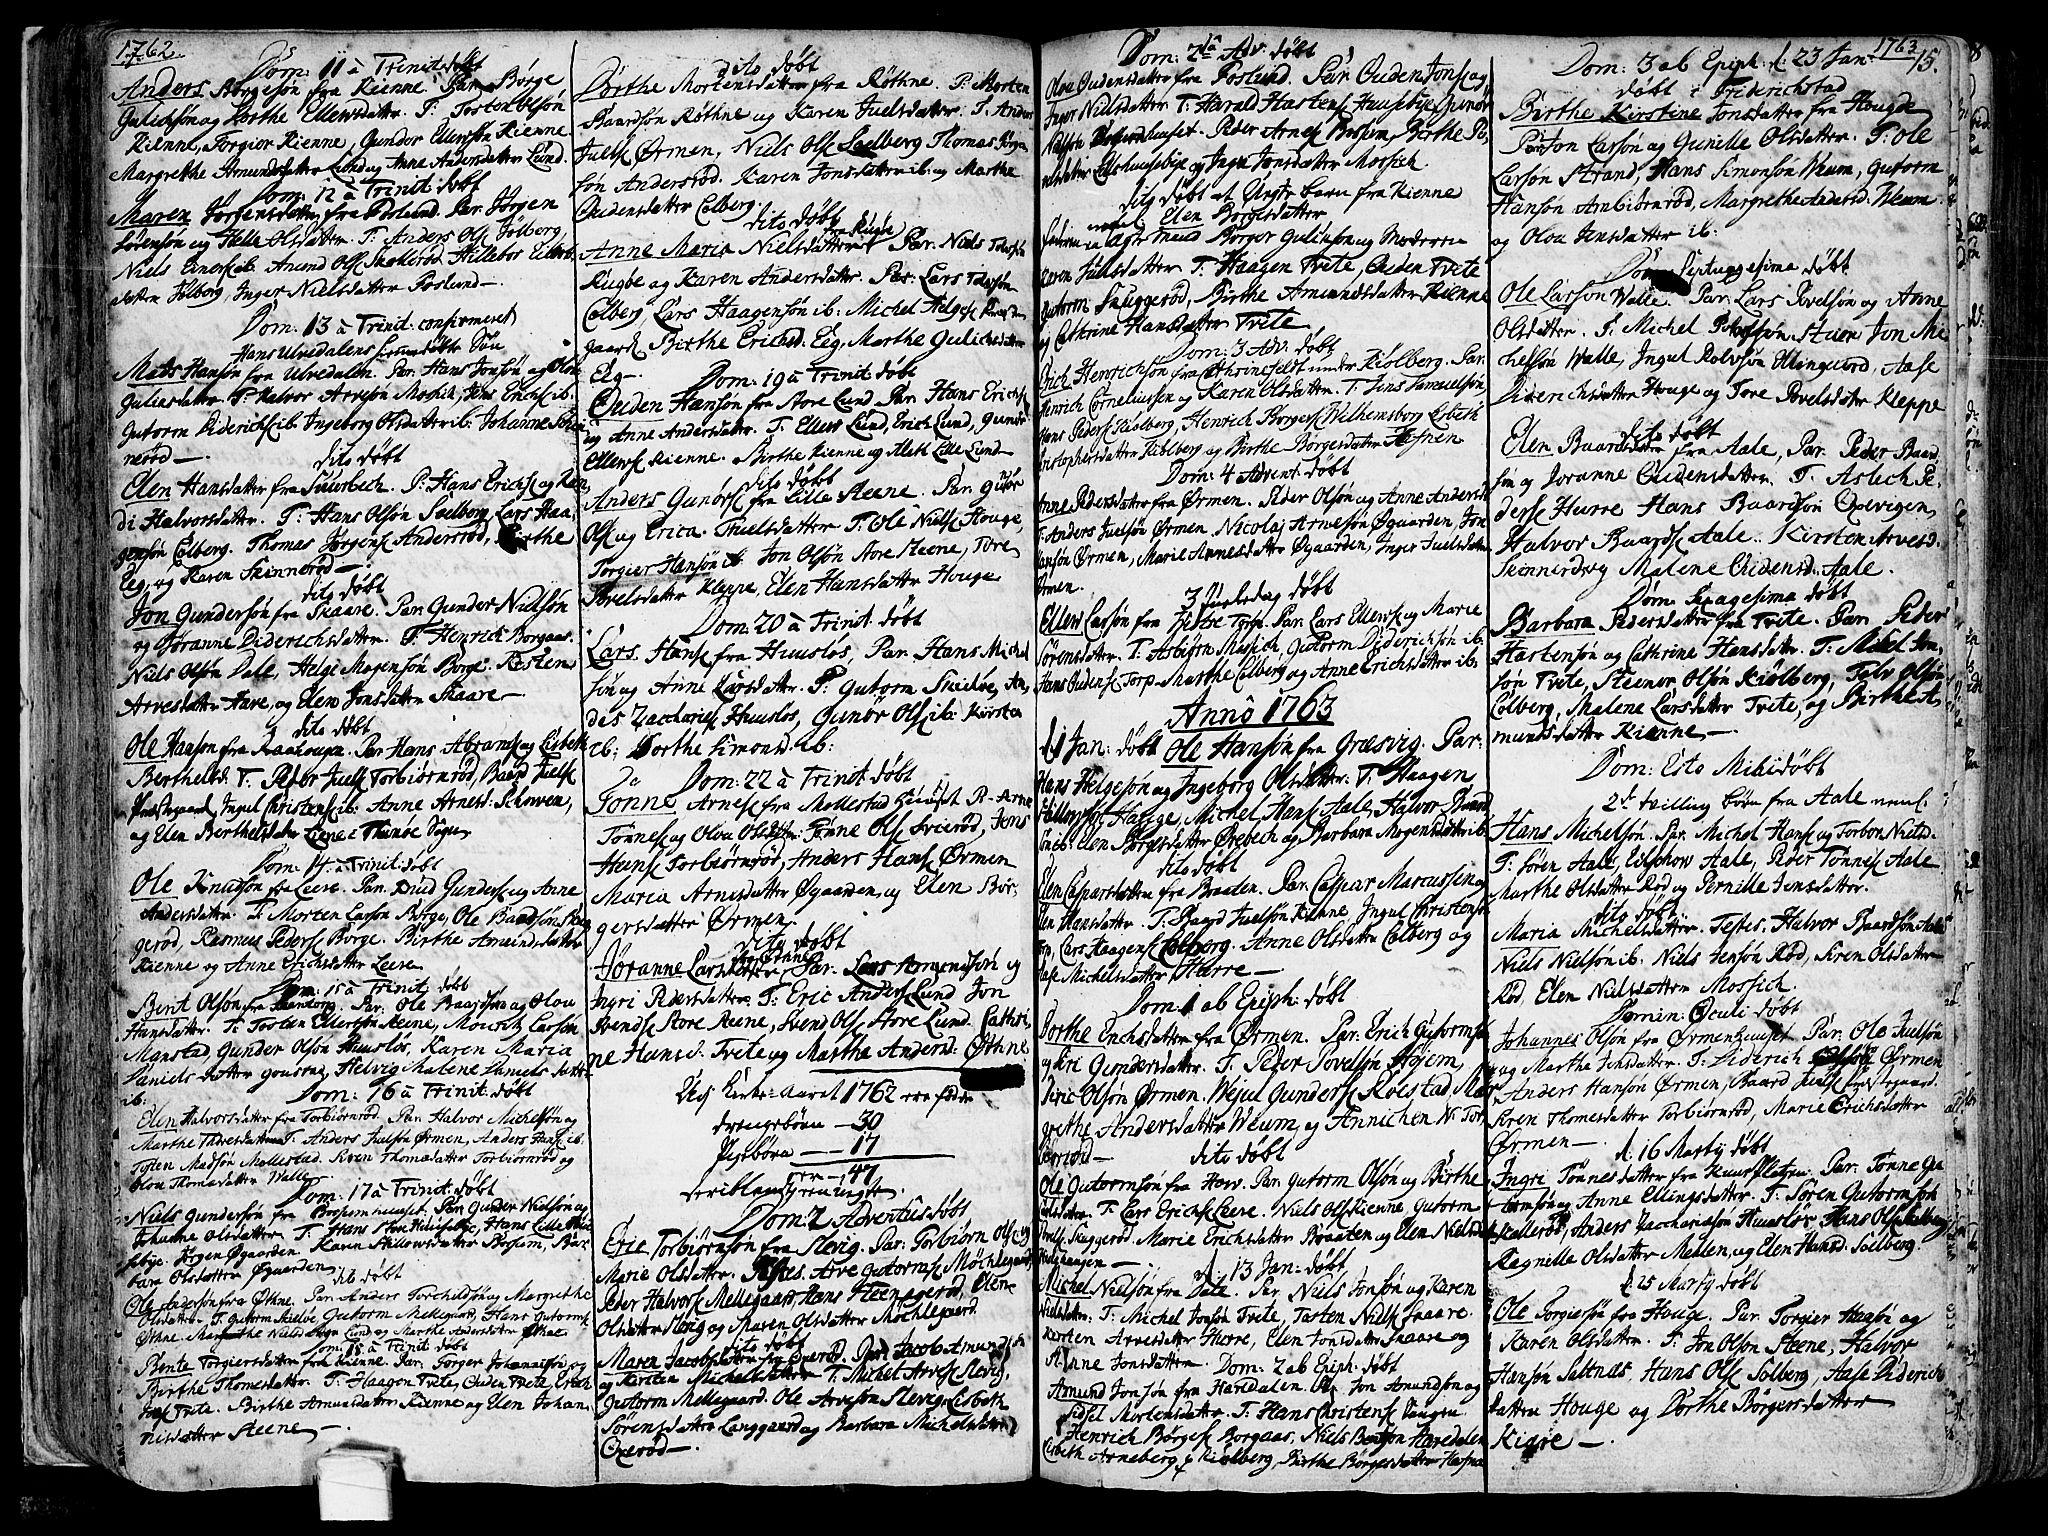 SAO, Onsøy prestekontor Kirkebøker, F/Fa/L0001: Ministerialbok nr. I 1, 1733-1814, s. 75